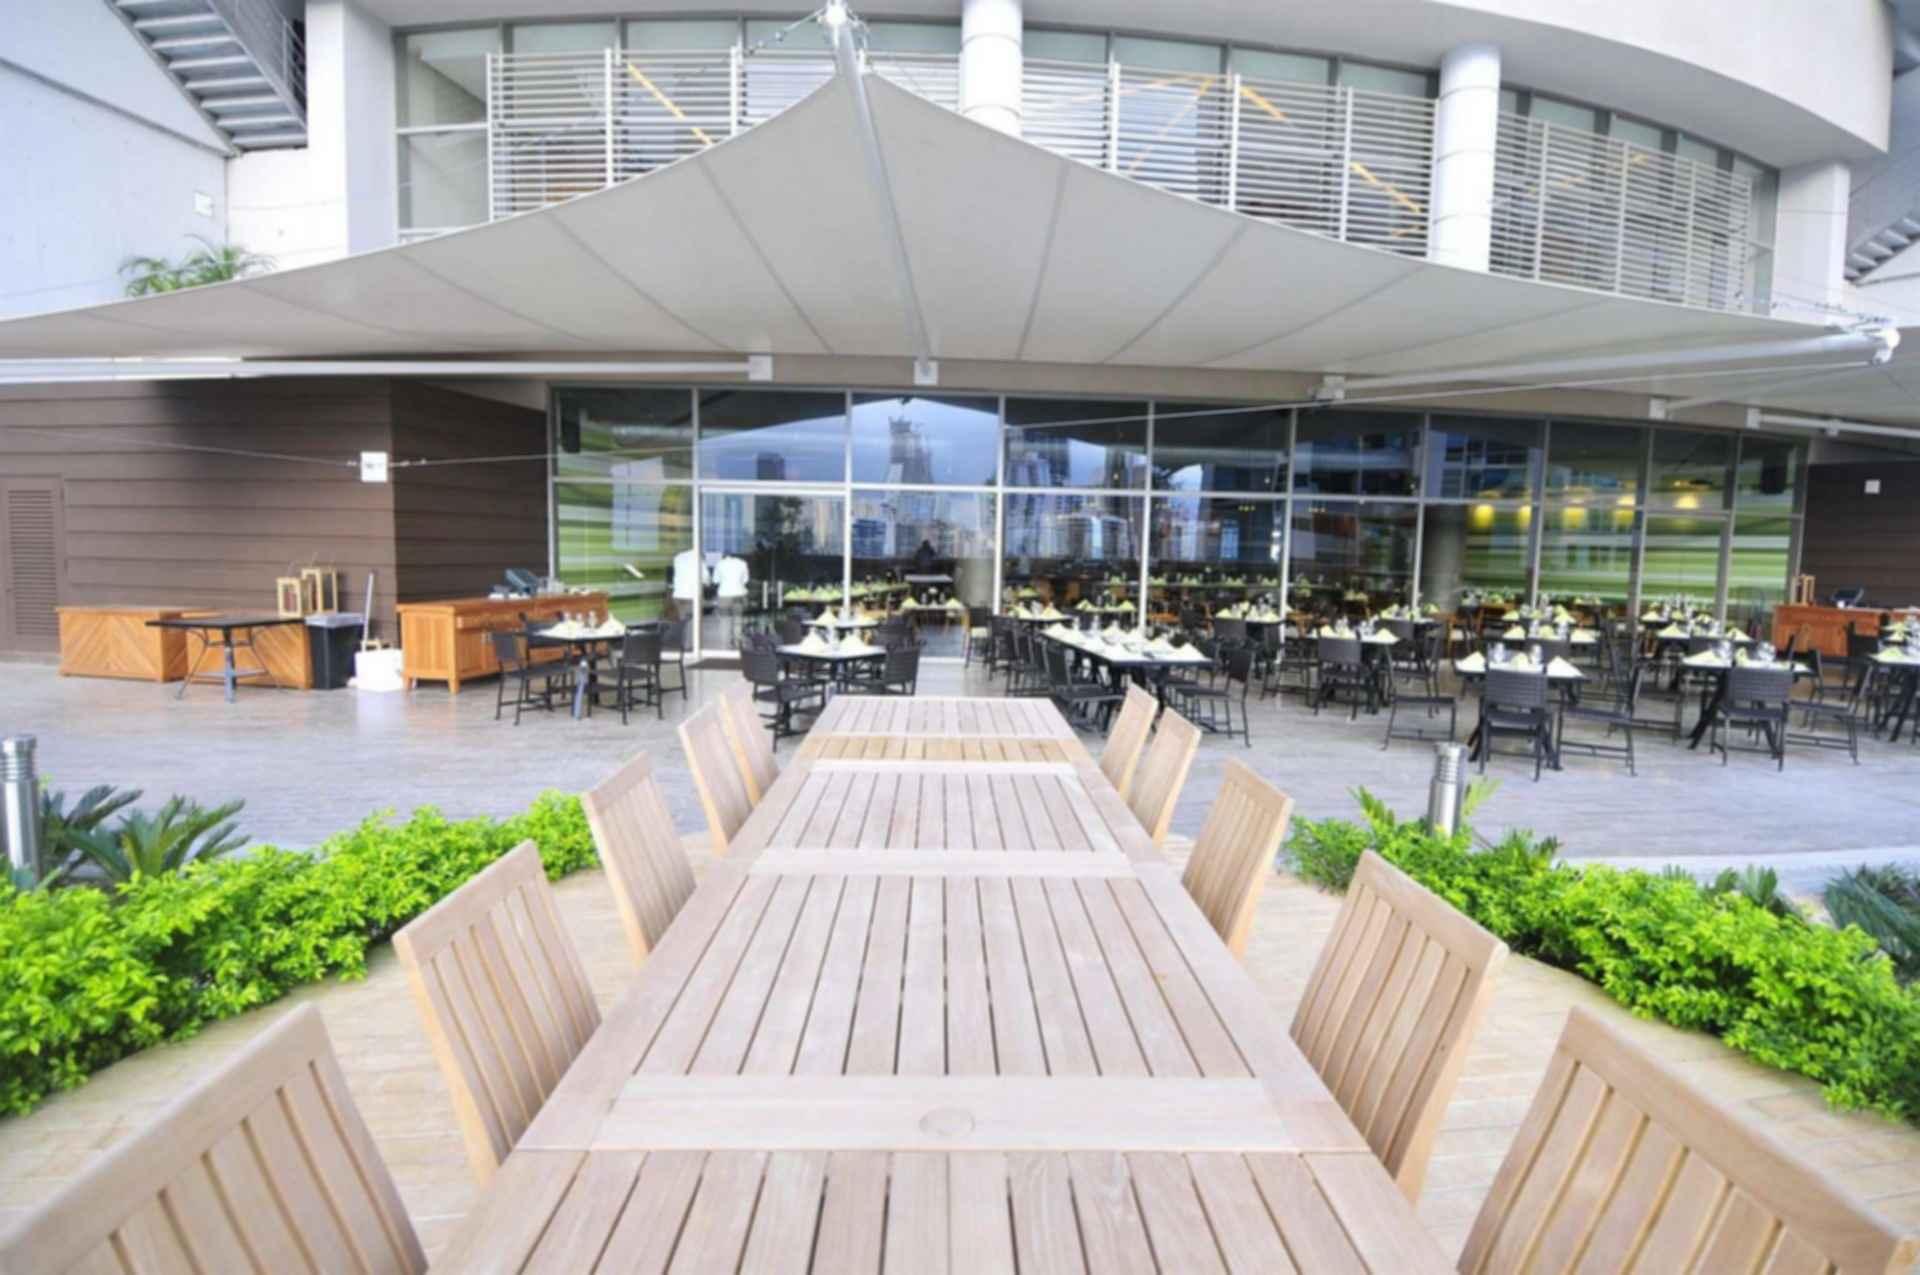 Trump Ocean Club International Hotel and Tower, Panama - Outdoor Area